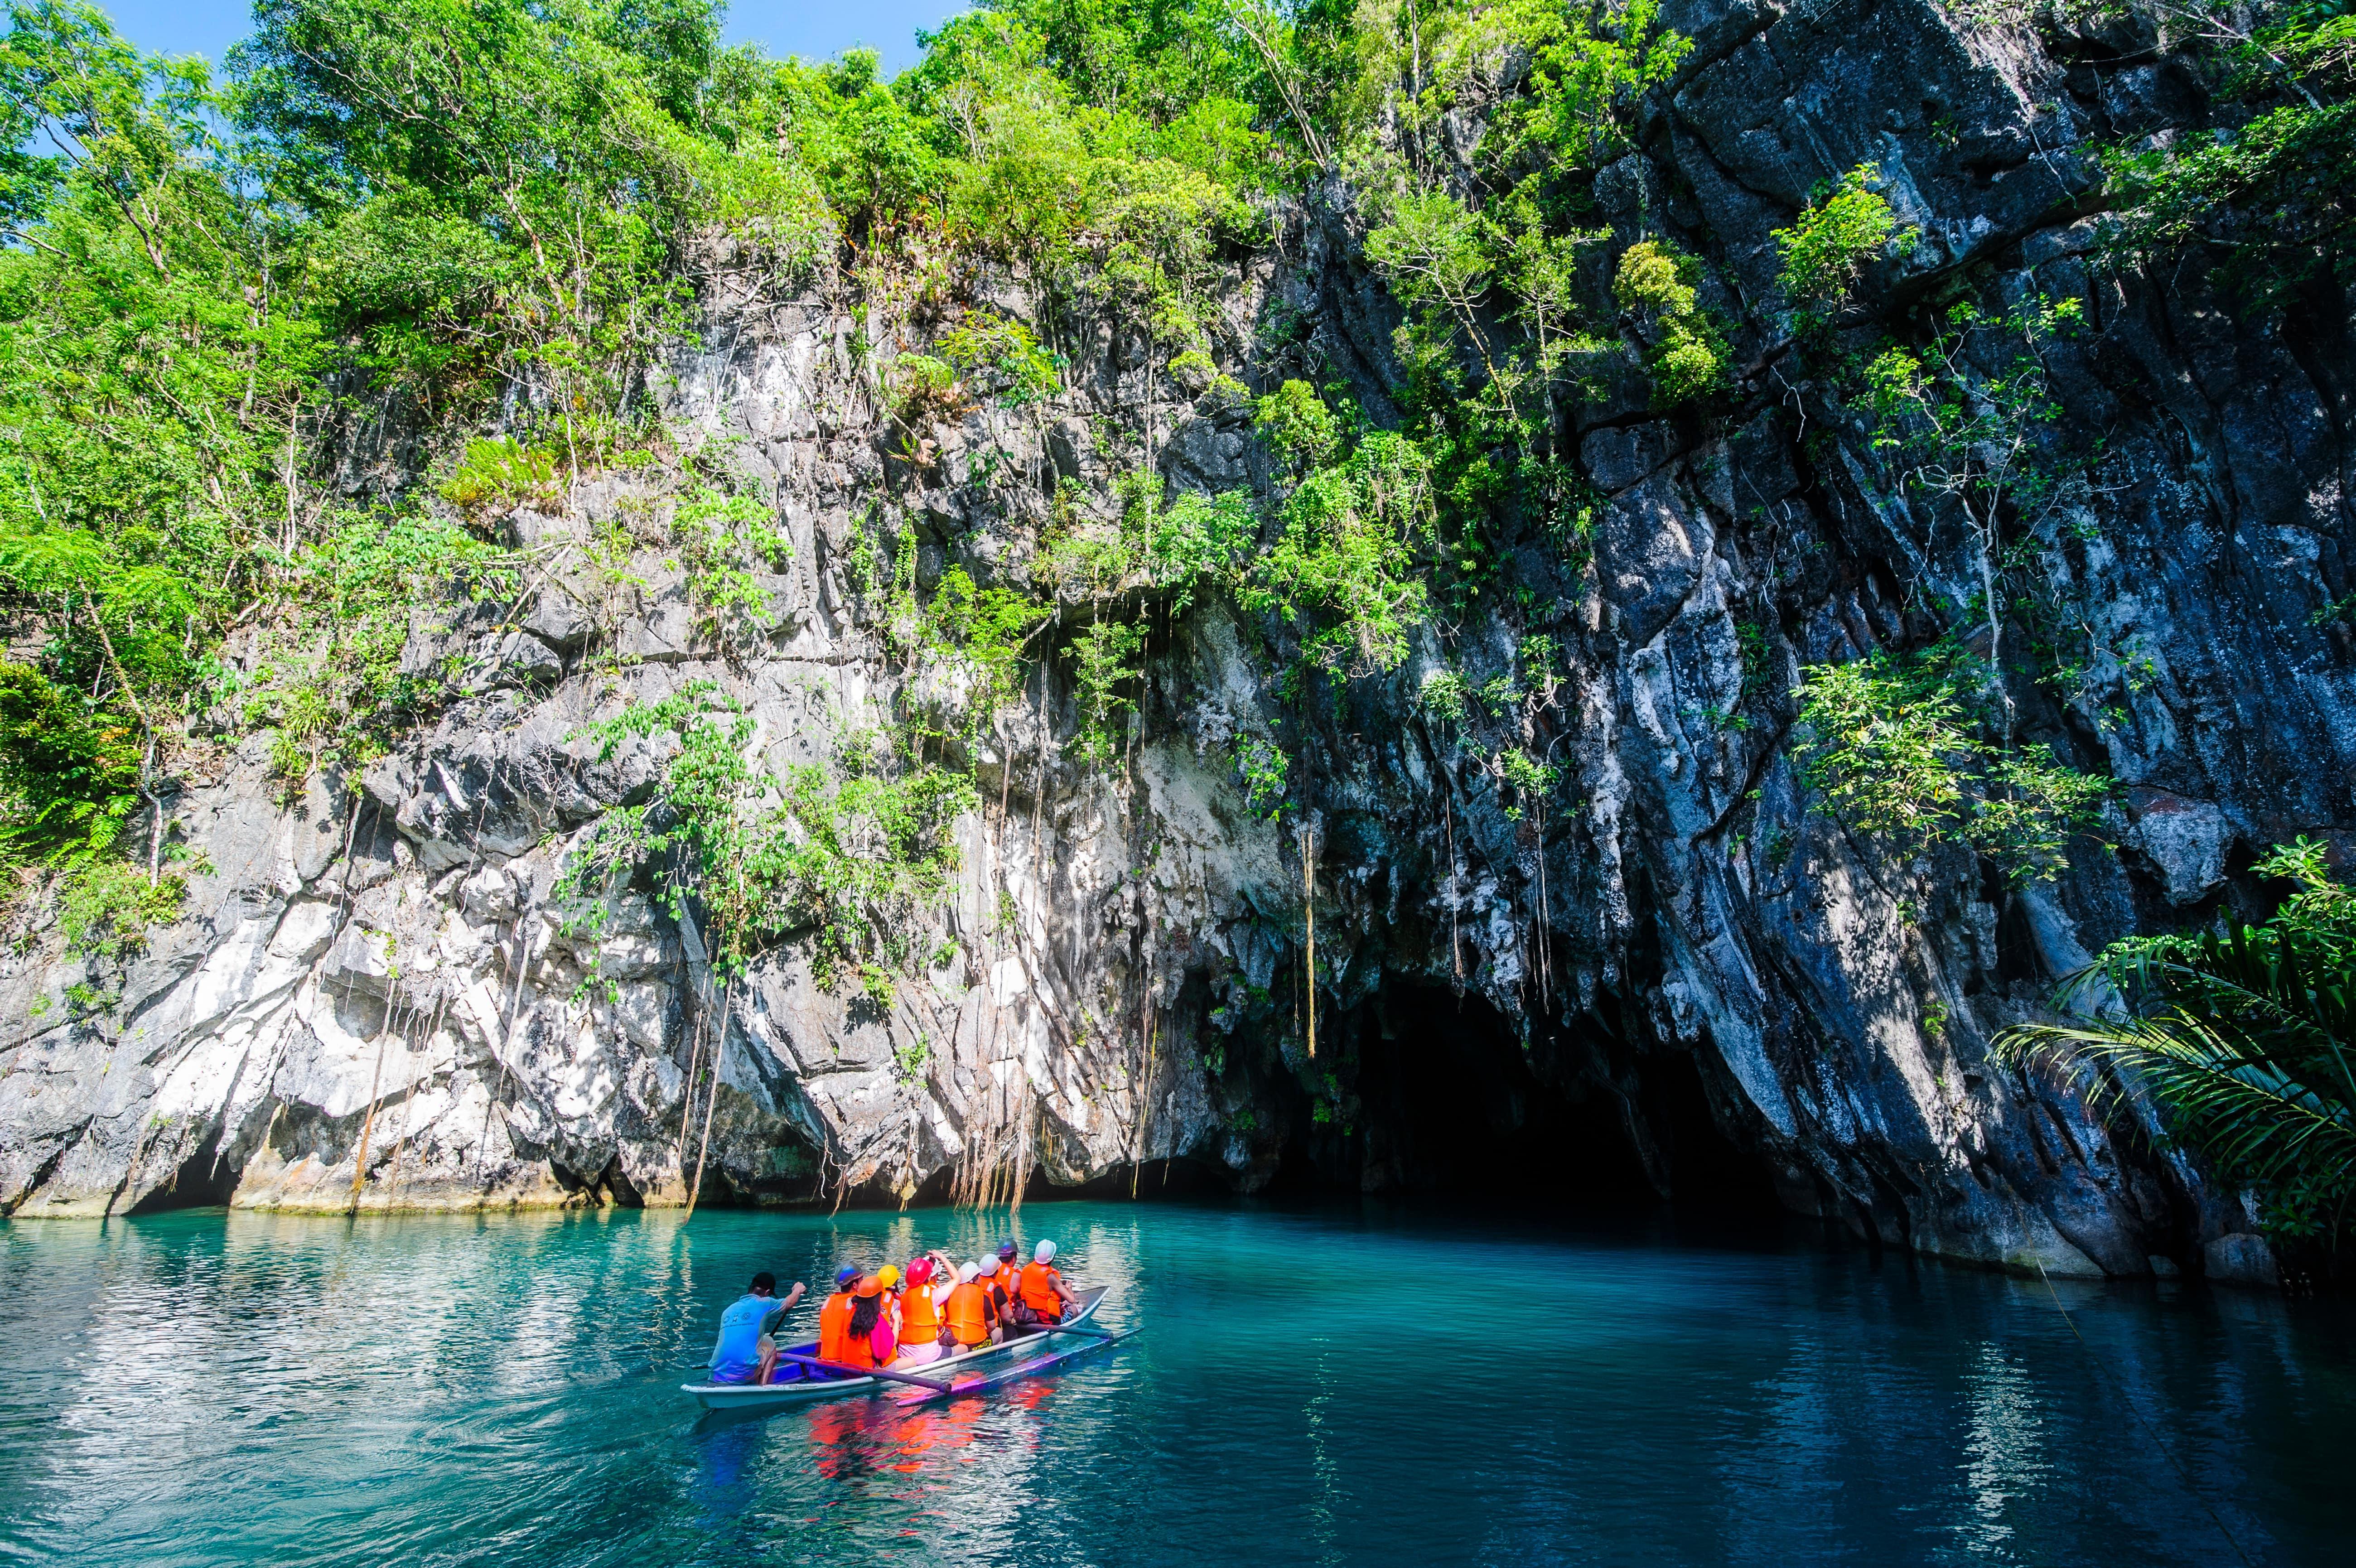 Entrance to Puerto Princesa's Underground River